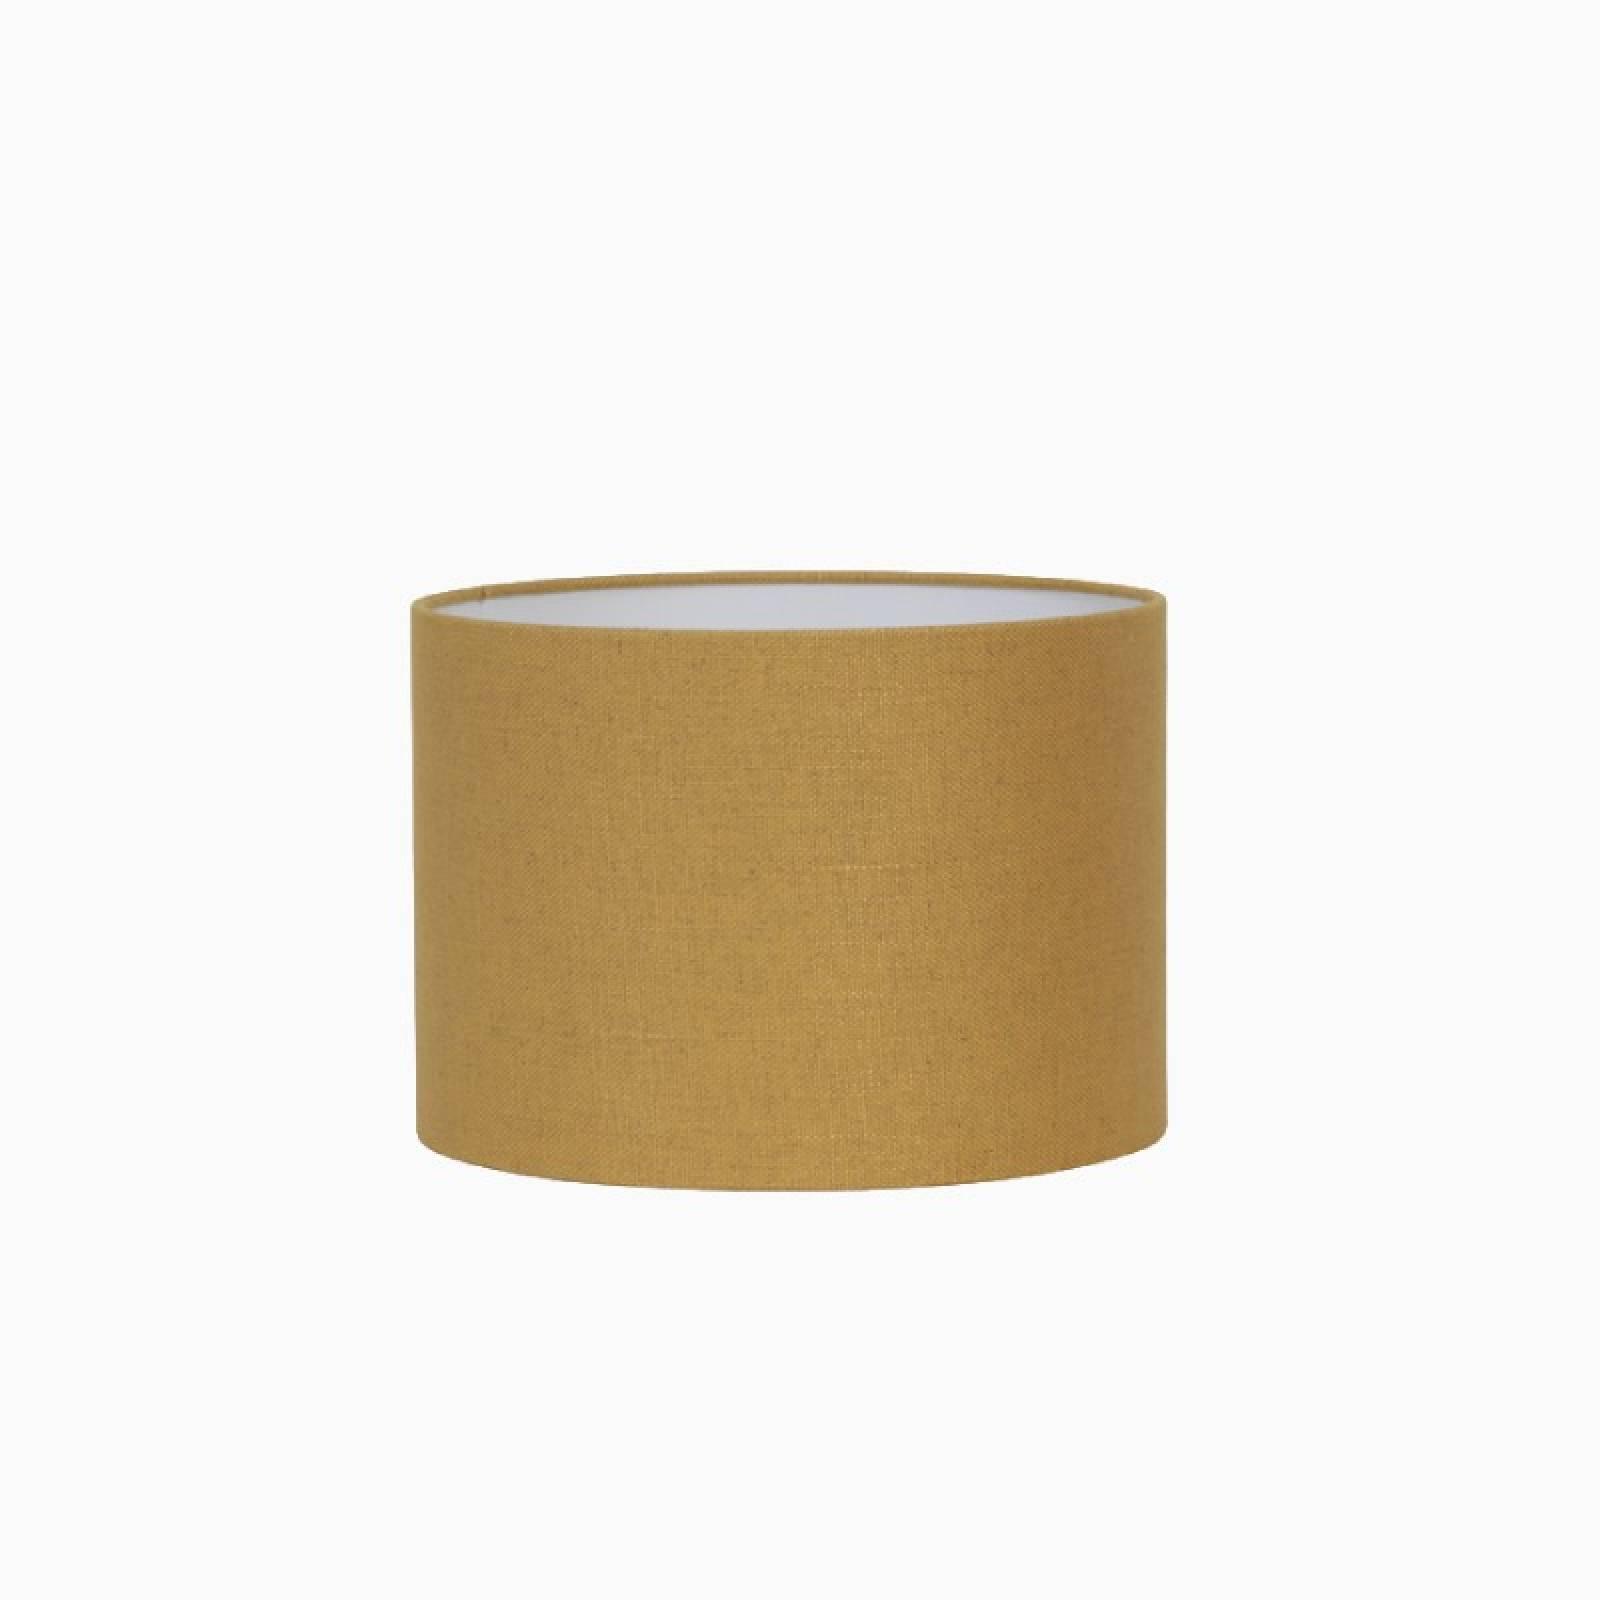 Small Linen Shade In Ochre Yellow 20cm